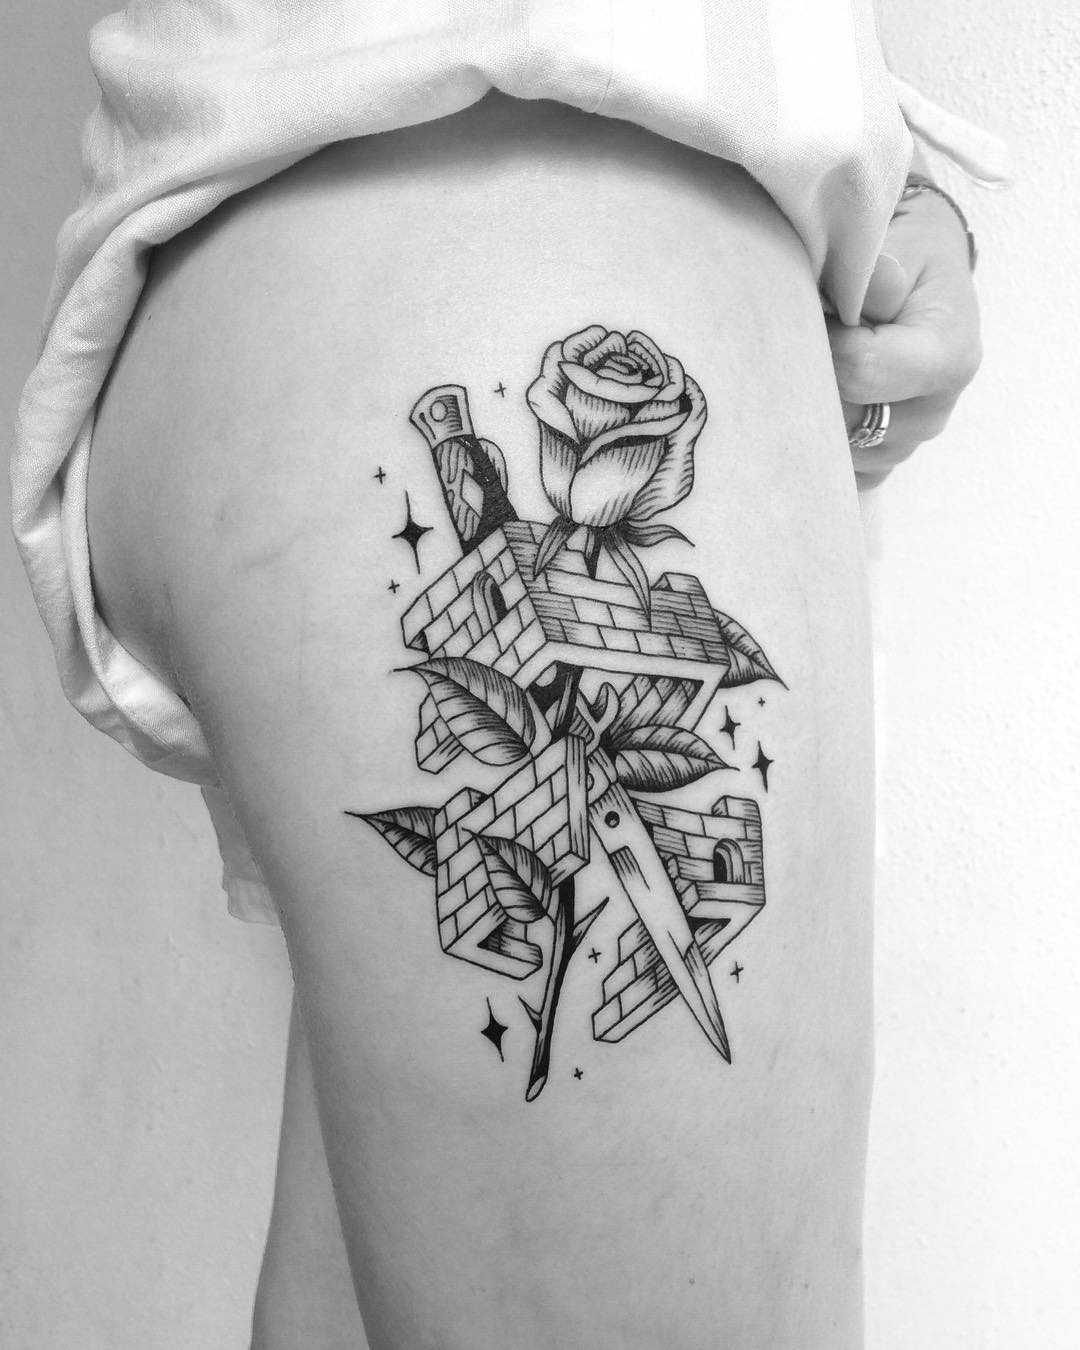 Knife, rose, and demolished house tattoo